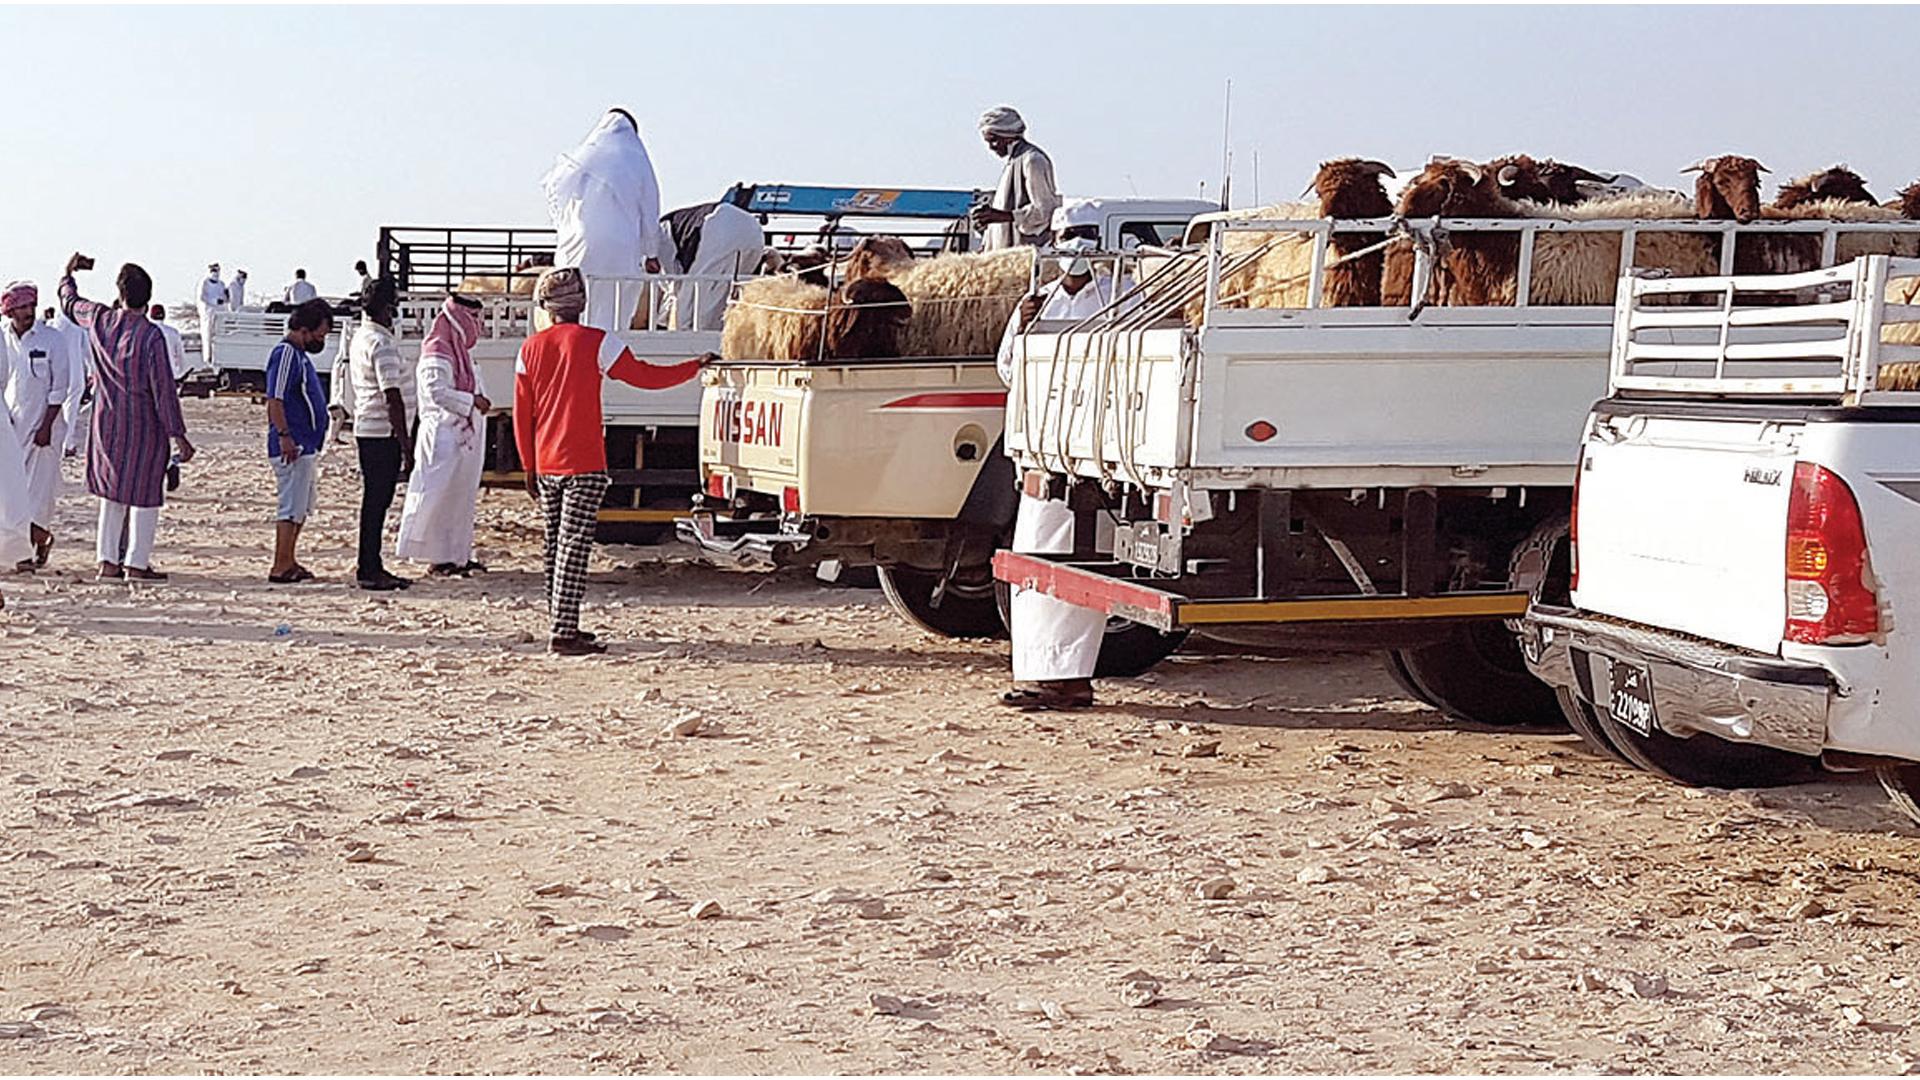 Random market sells sacrifices in Abu Nakhla